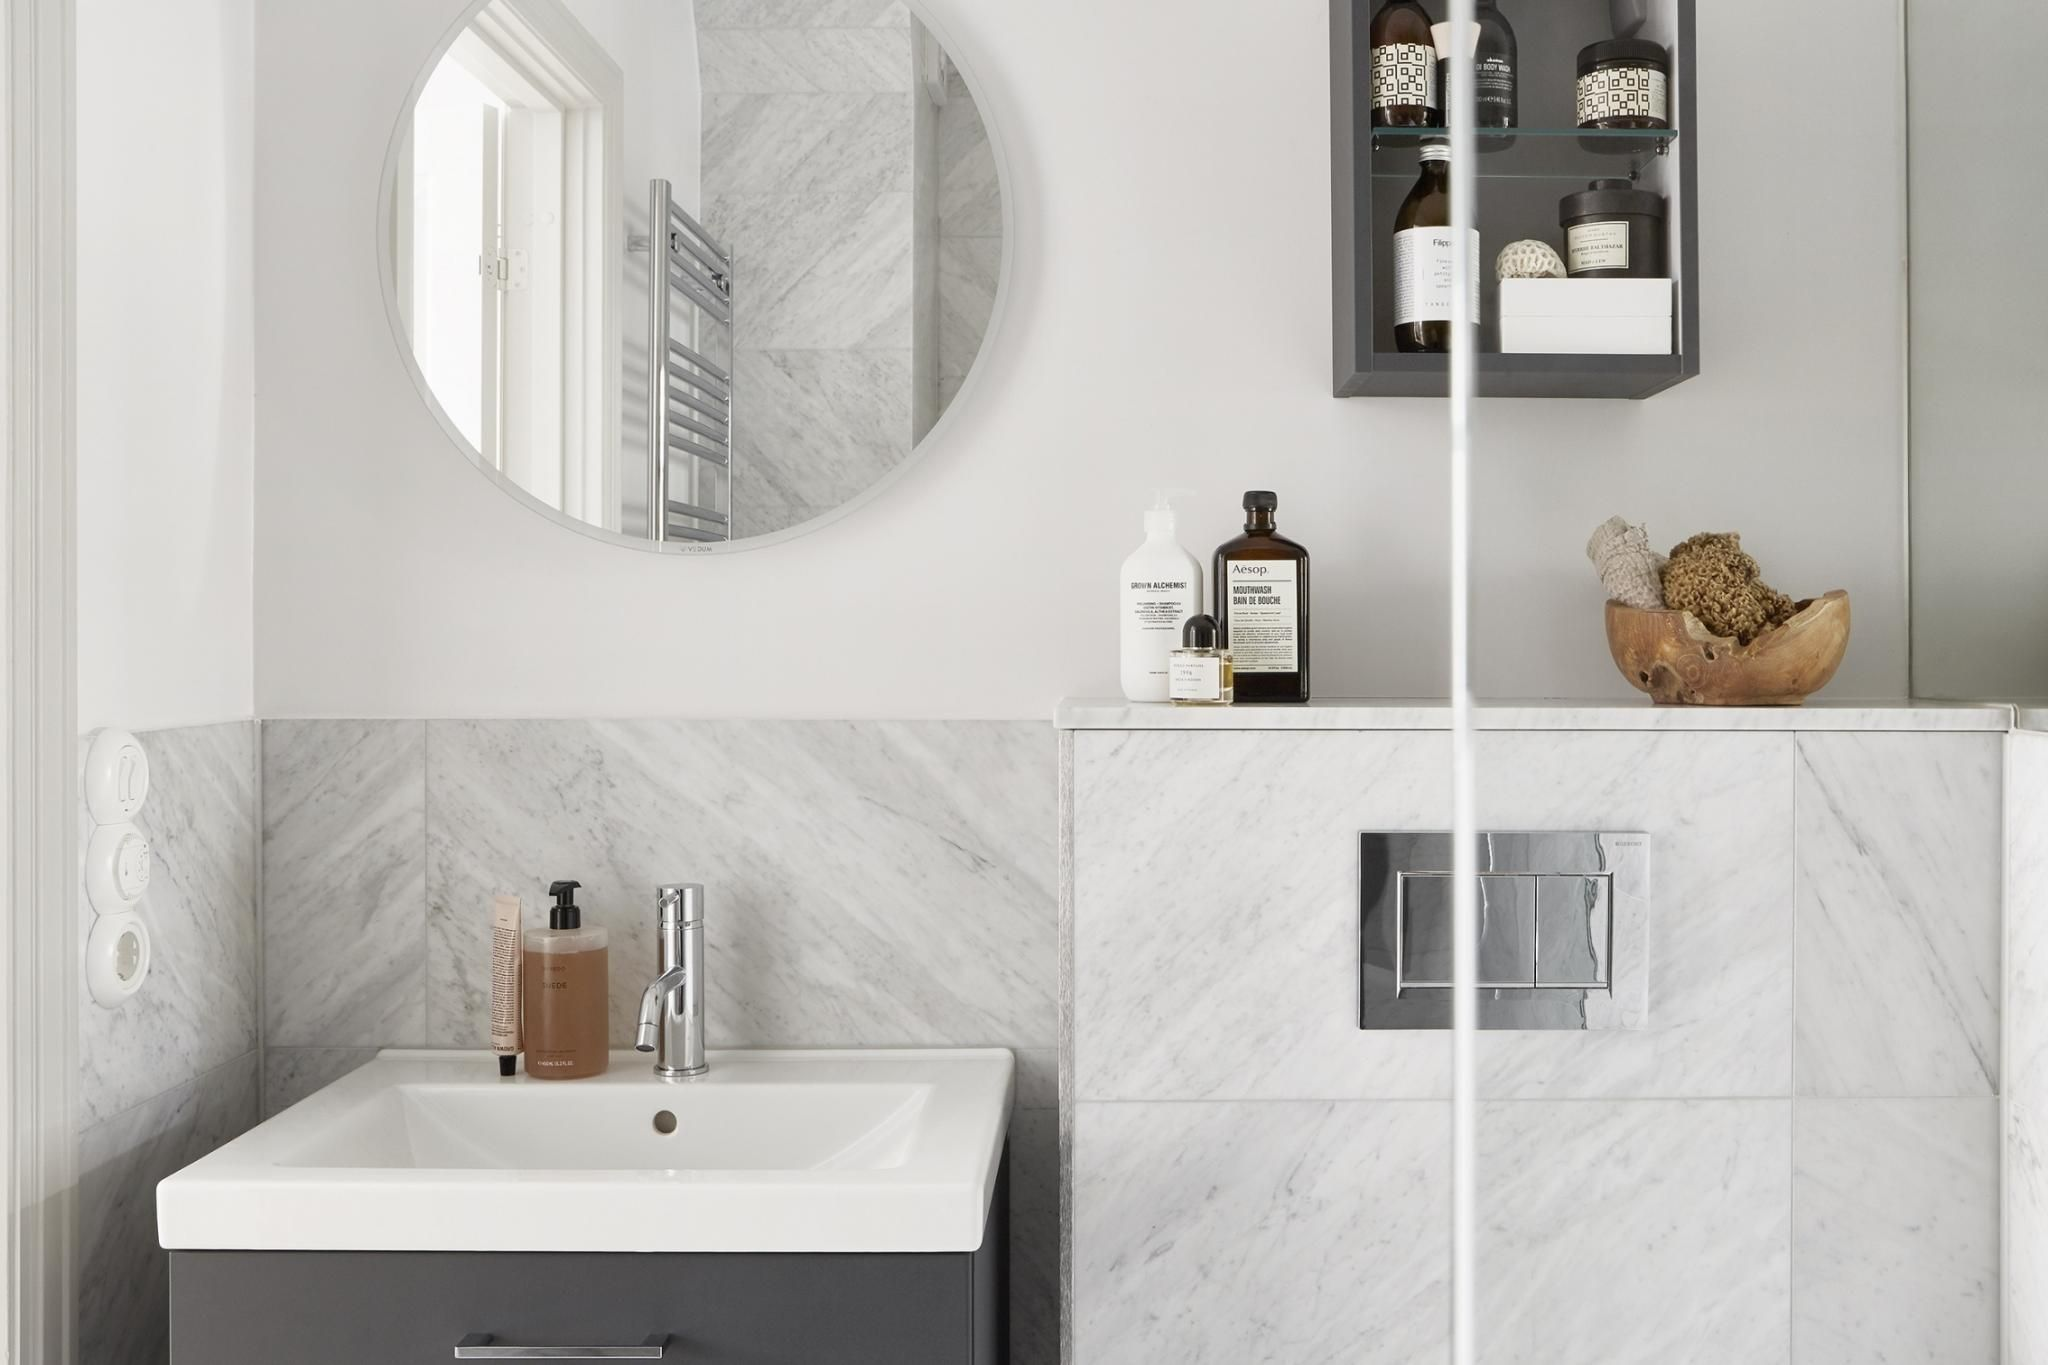 Badkamer Met Strandgevoel : Dit beige interieur geeft je dat rustgevende strandgevoel